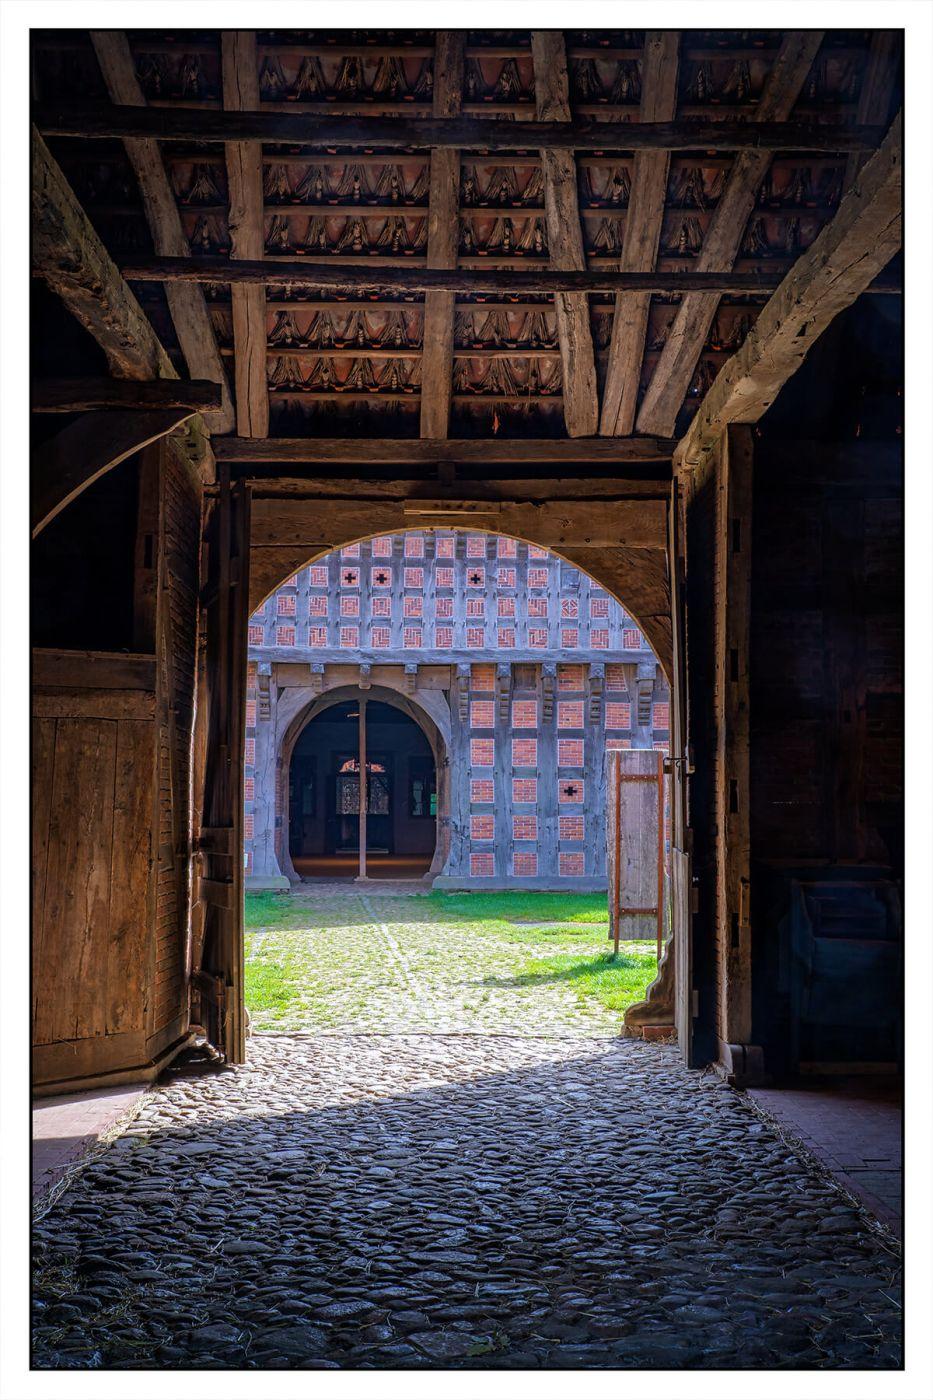 Museumsdorf Cloppenburg, Germany